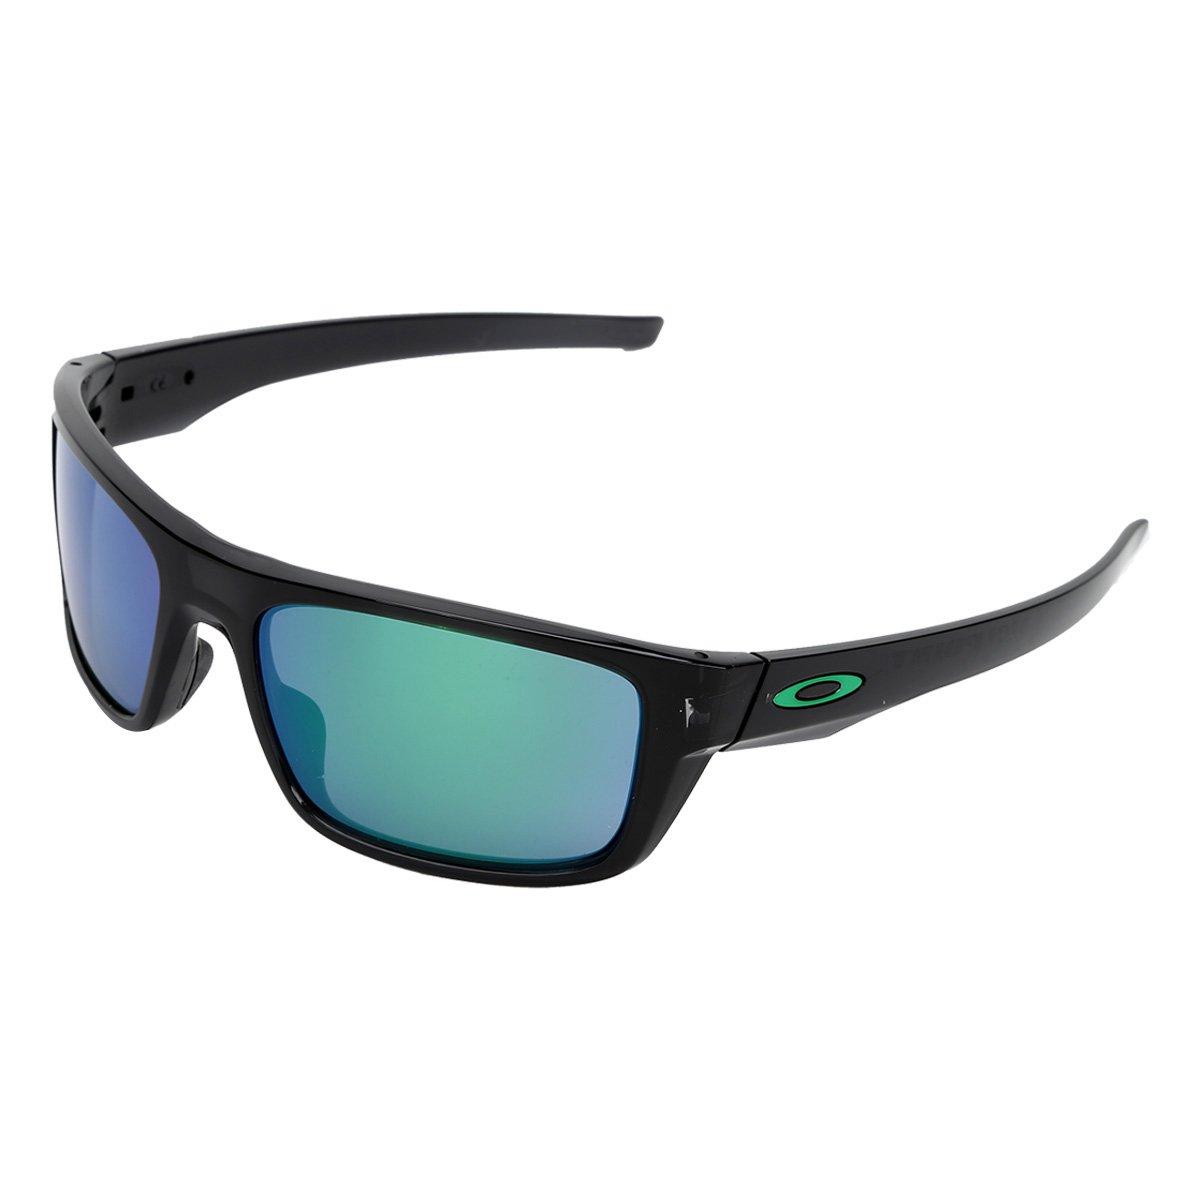 8370d912bb613 Óculos de Sol Oakley Drop Point Masculino - Preto e verde - Compre Agora